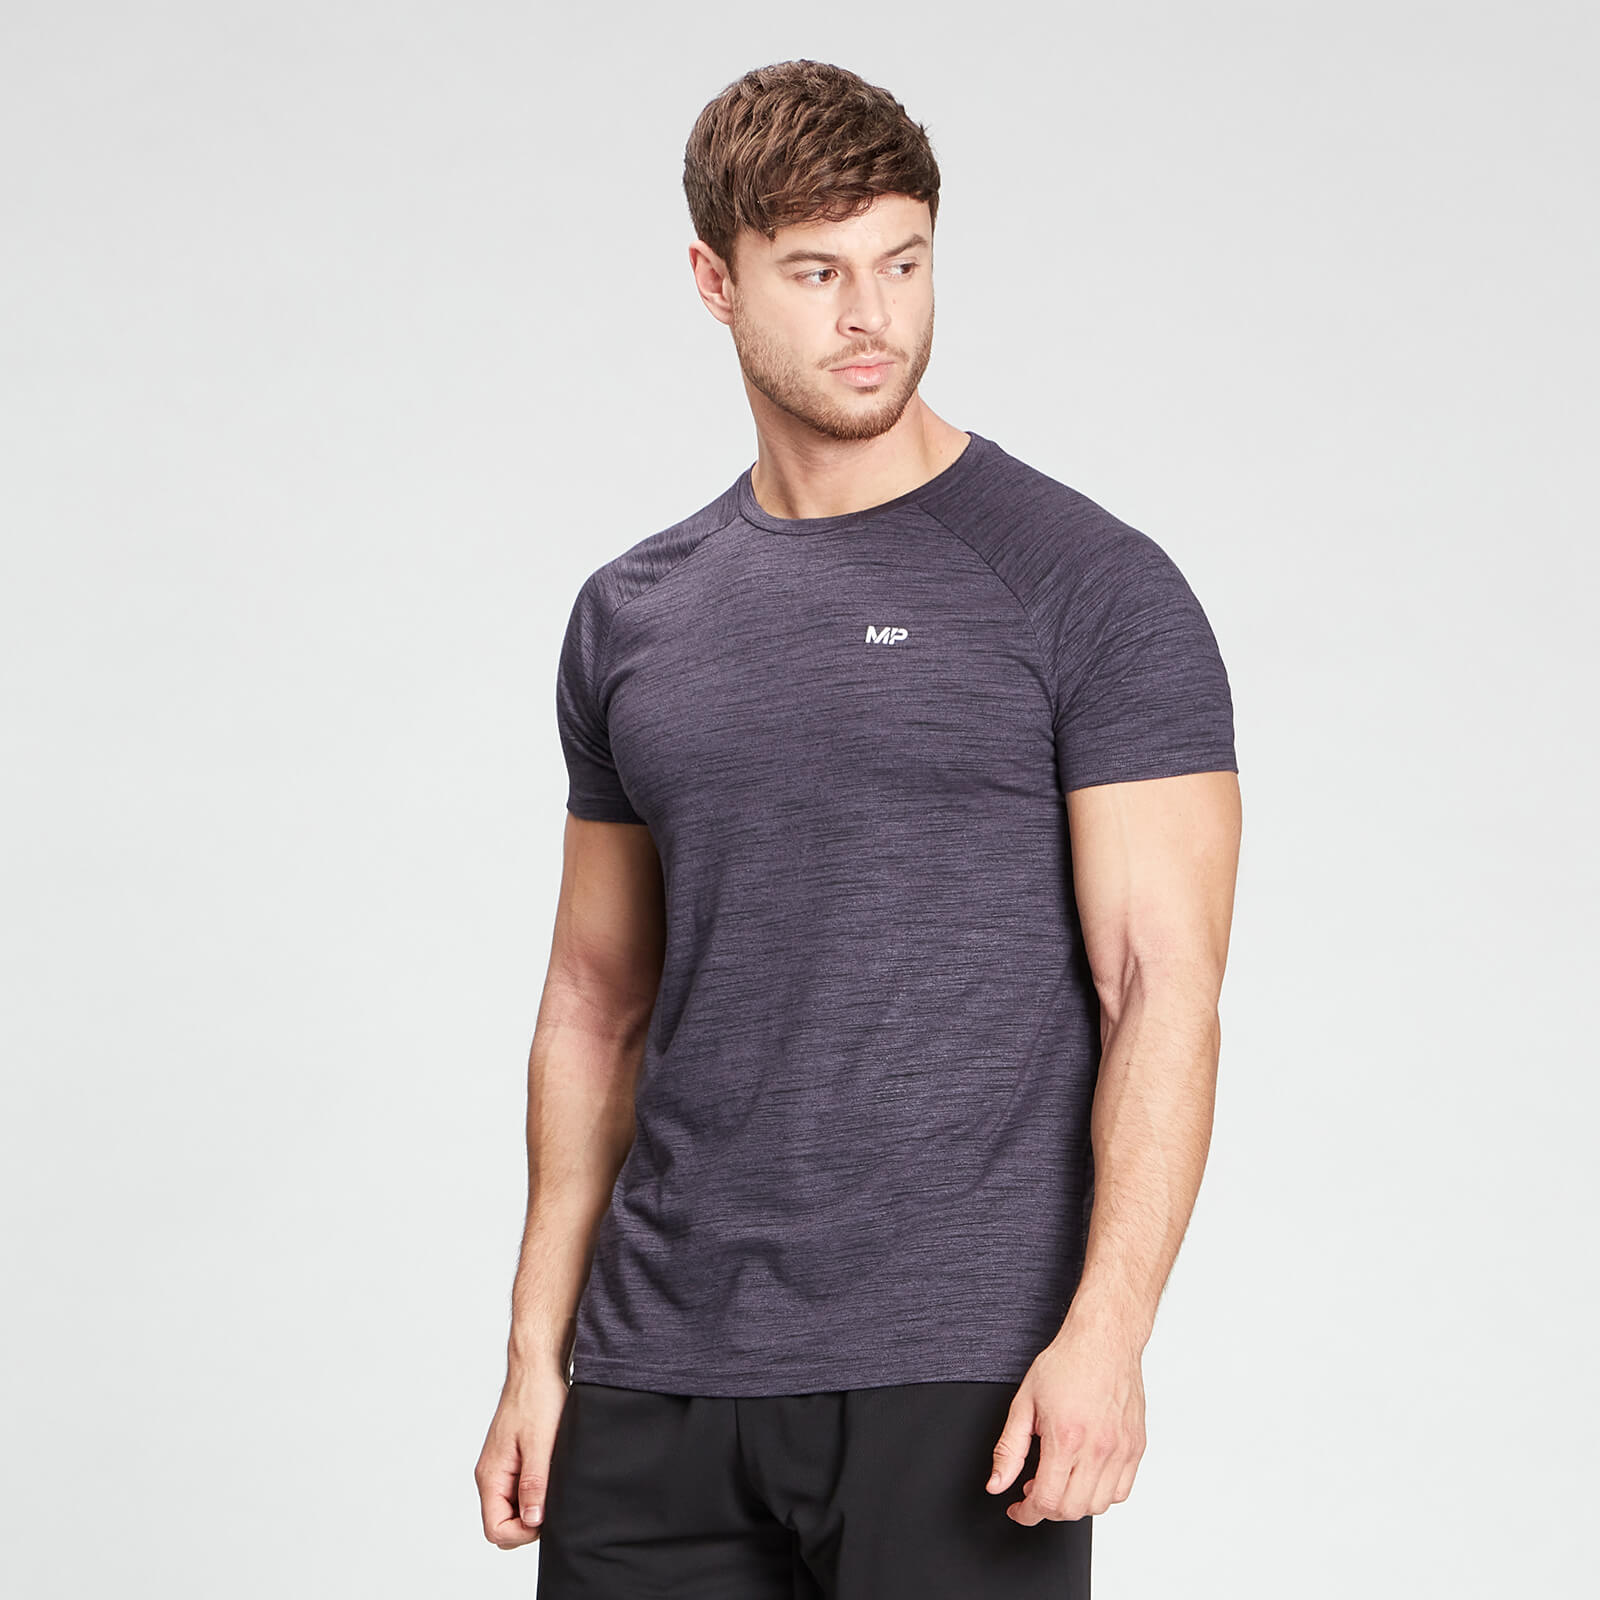 Купить MP Men's Performance Short Sleeve T-Shirt - Smokey Purple Marl - XXXL, Myprotein International